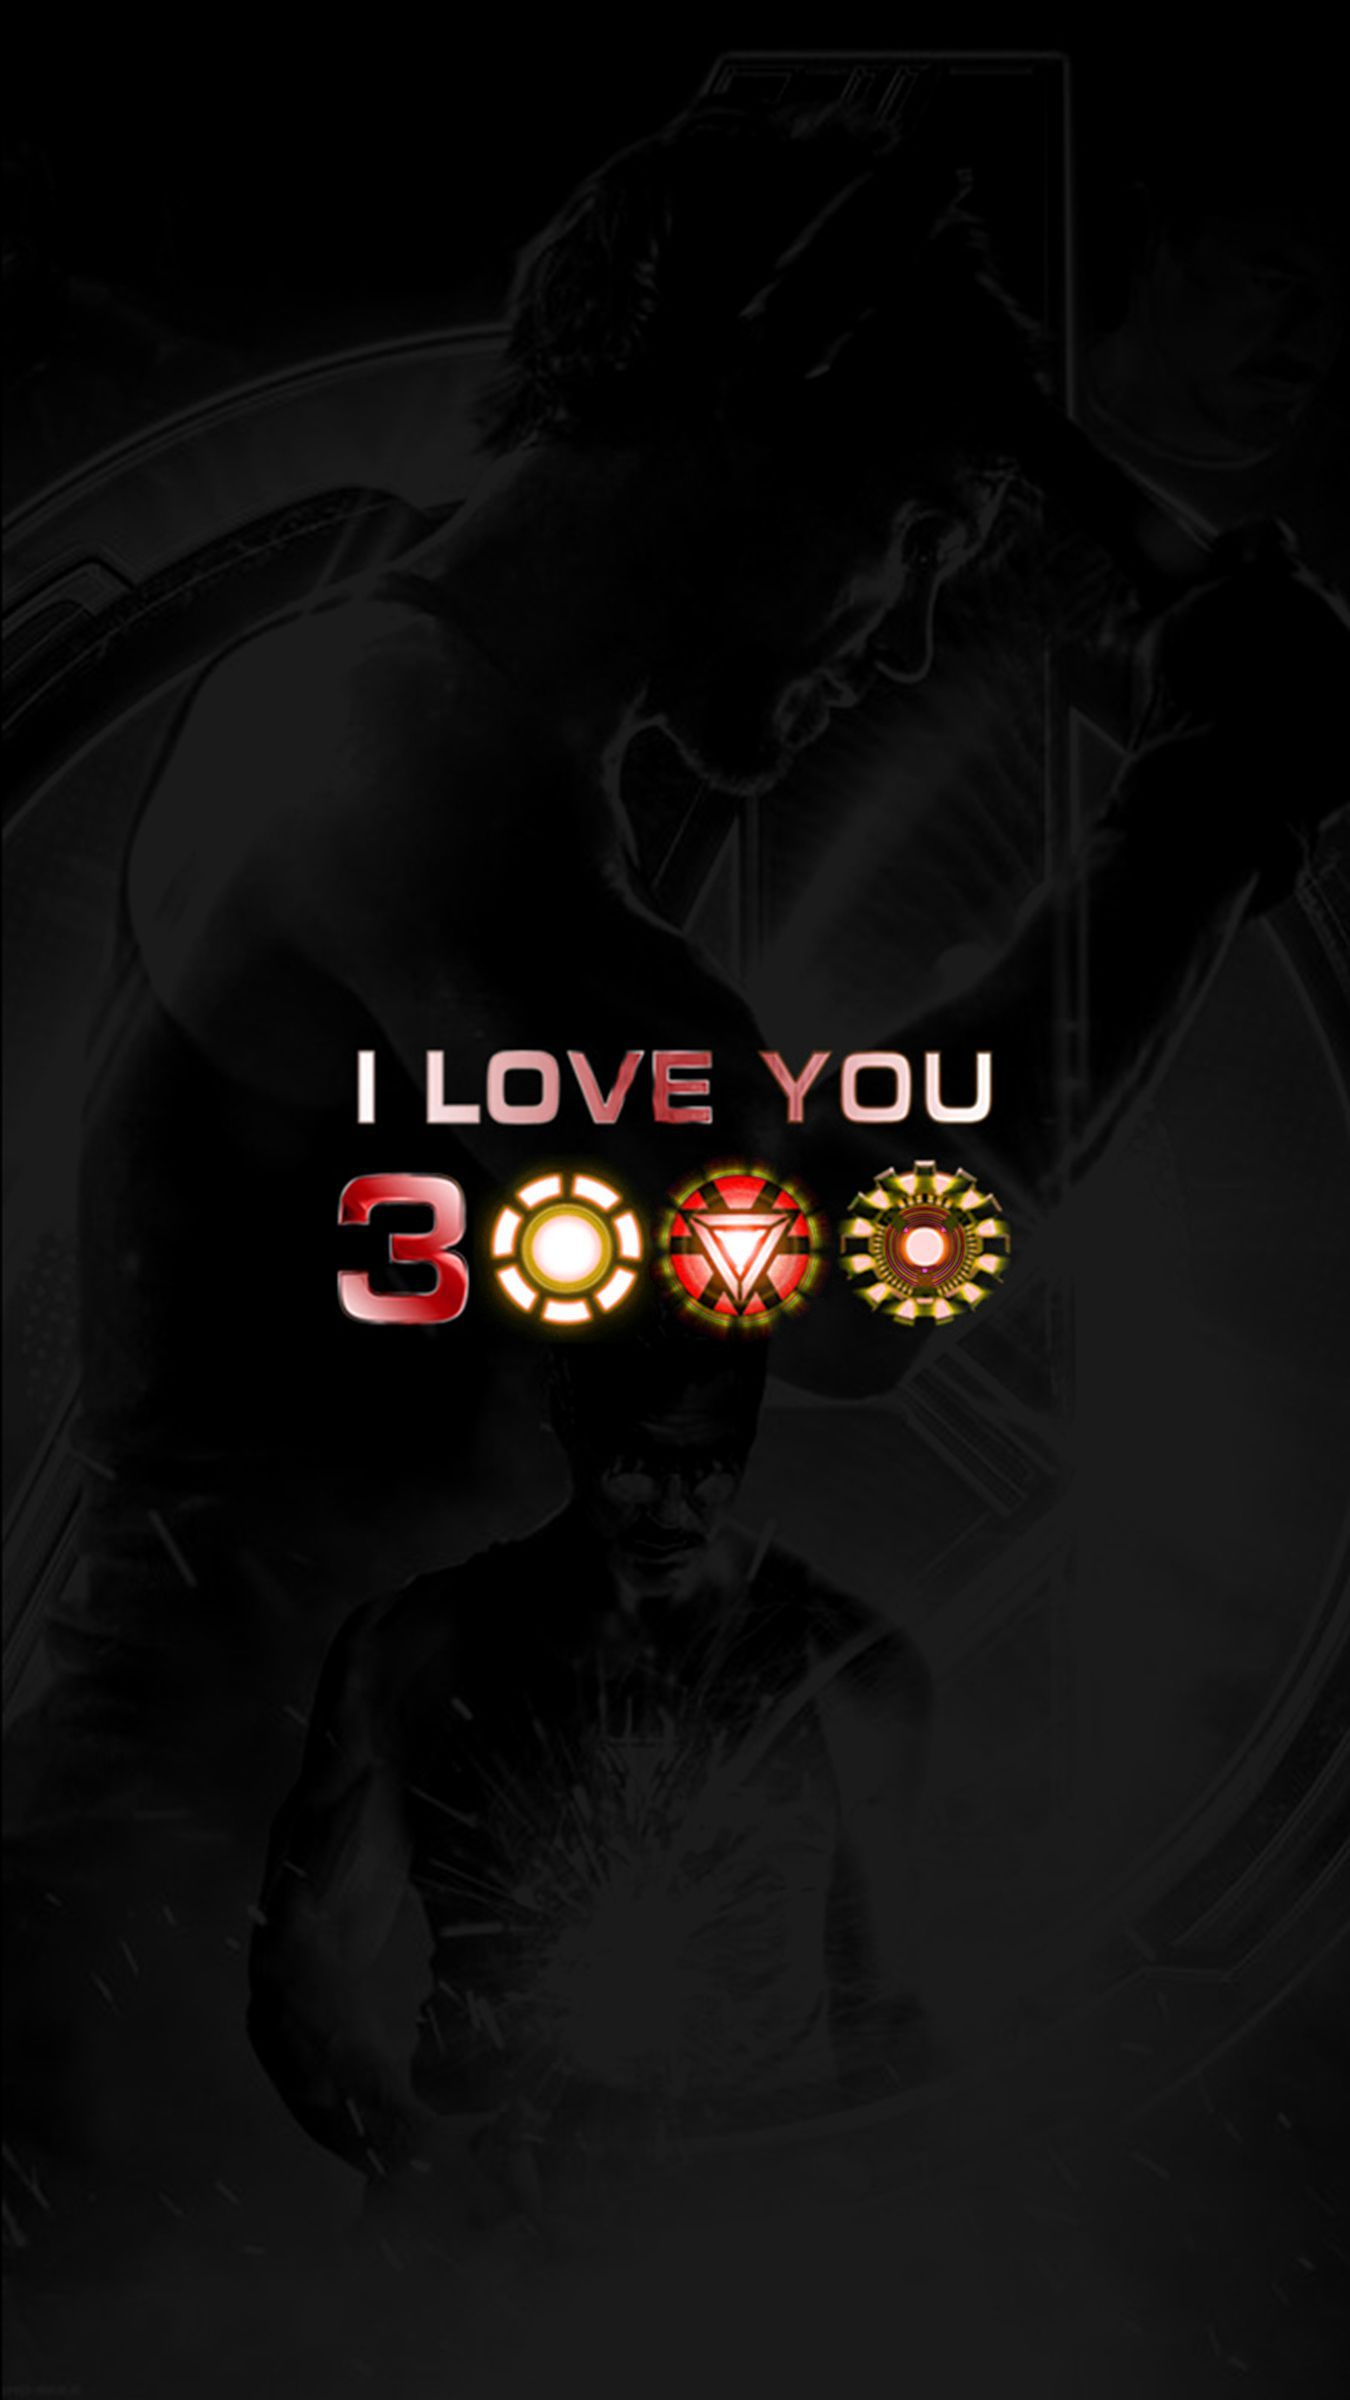 3000 you i love